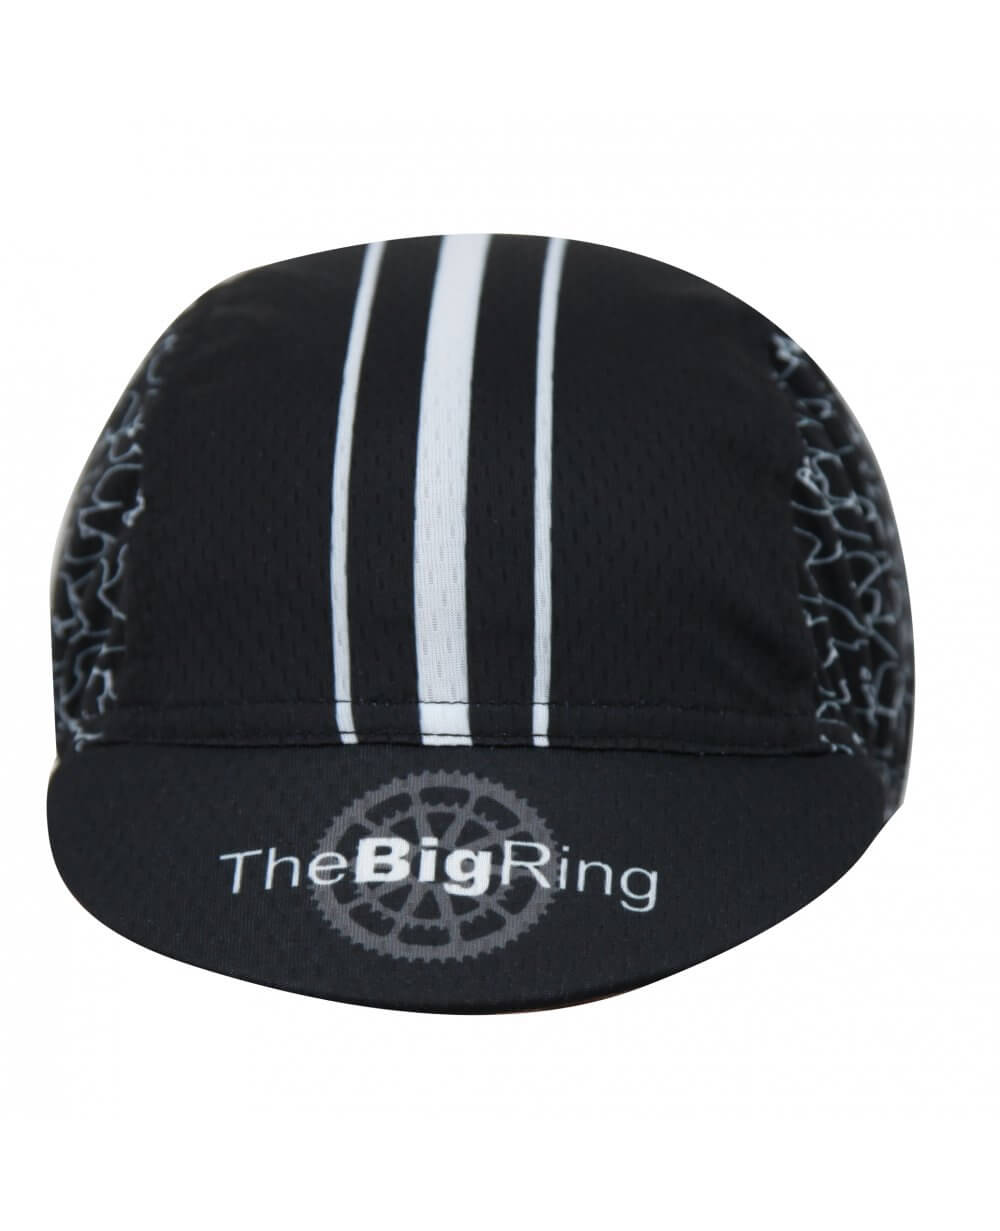 the Big Ring Cycling Cap